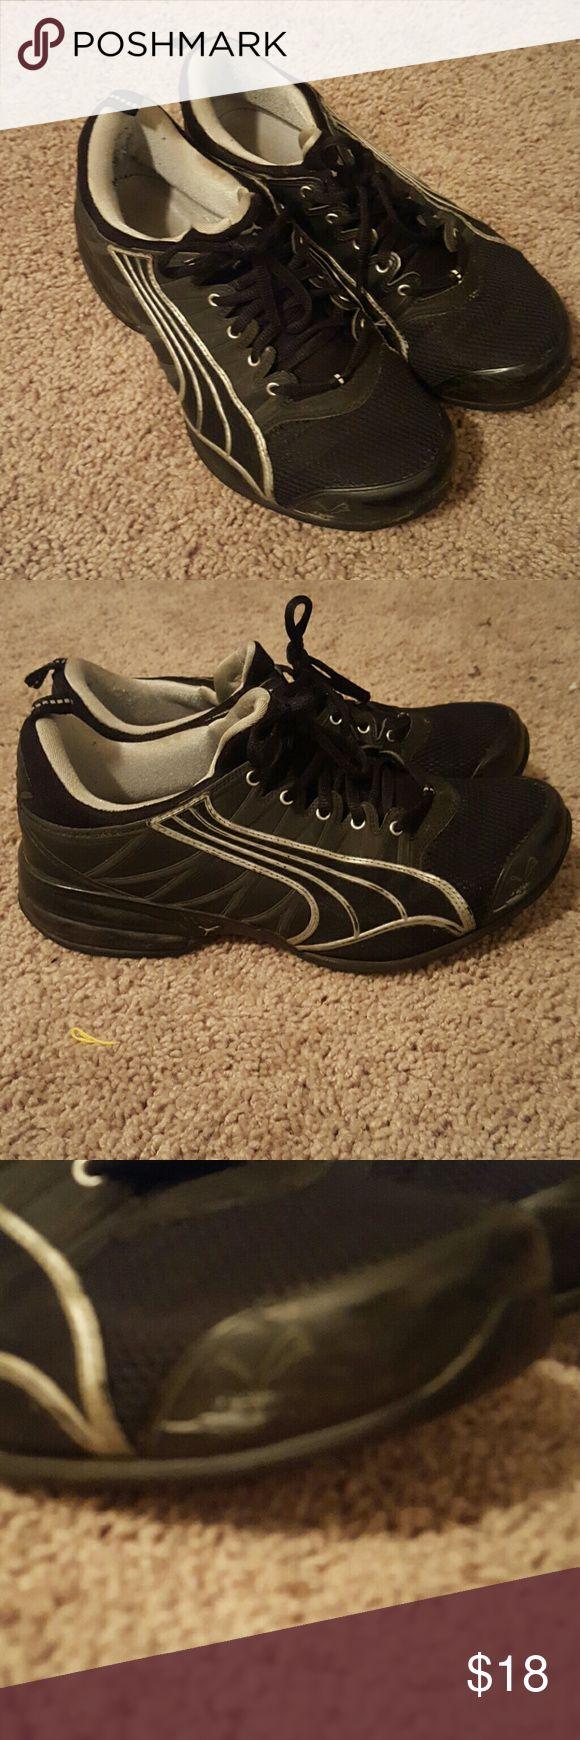 Size 10 Puma tennis shoes Lightly used size 10 Puma tennis shoes Puma Shoes Athletic Shoes